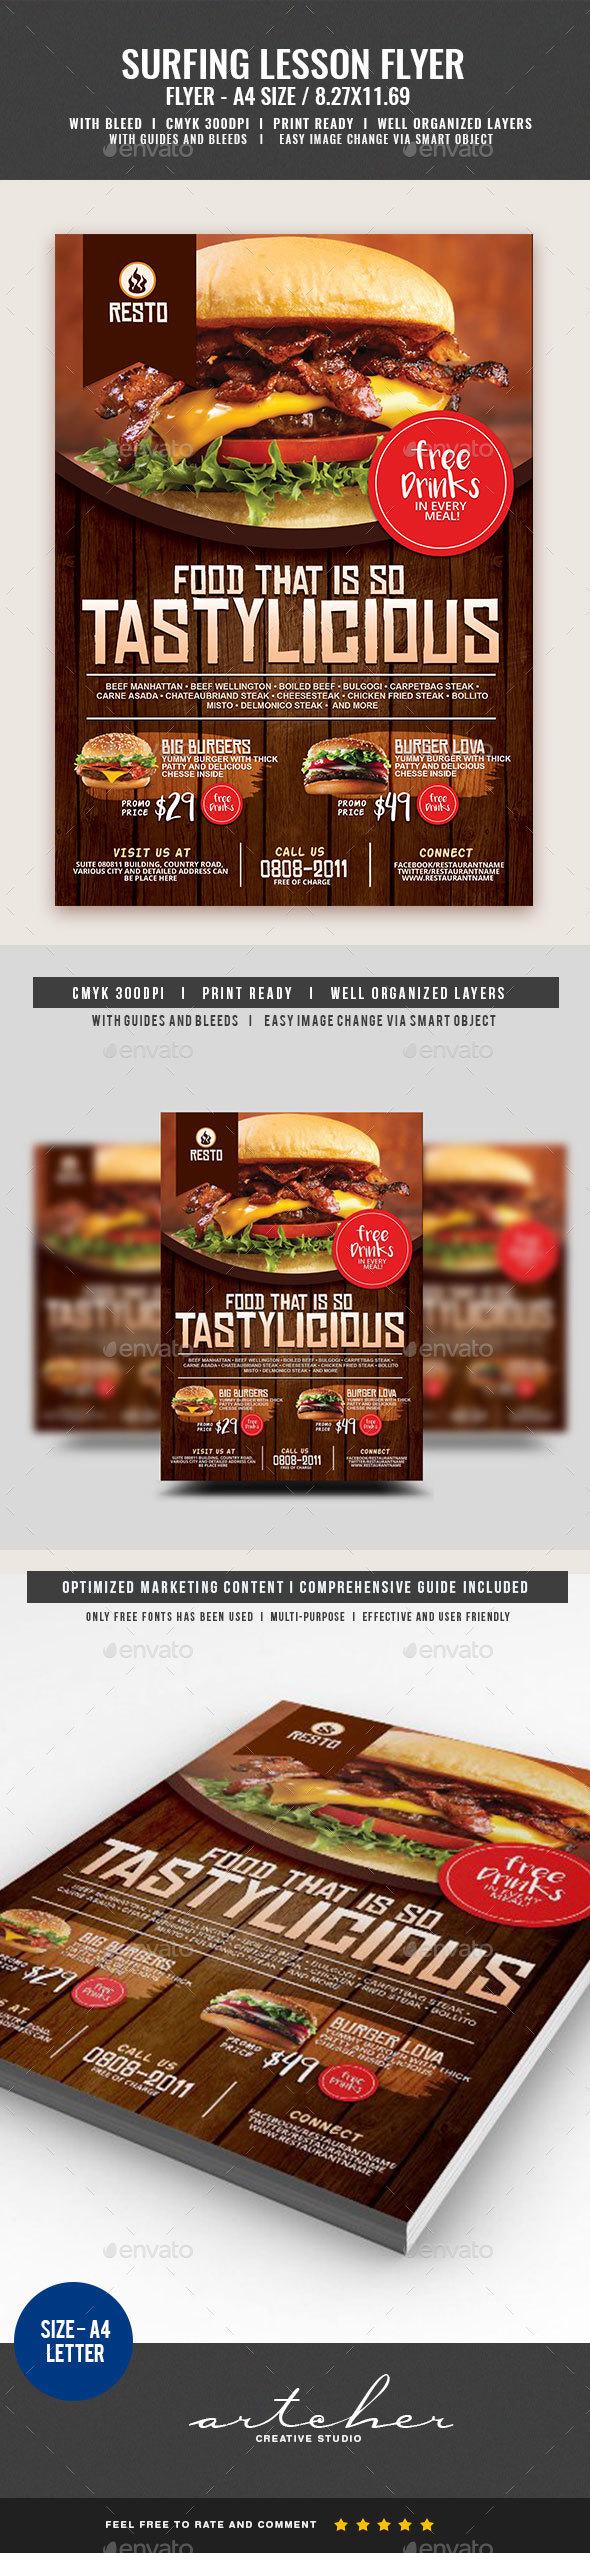 Restaurant Burger House Flyer - Restaurant Flyers